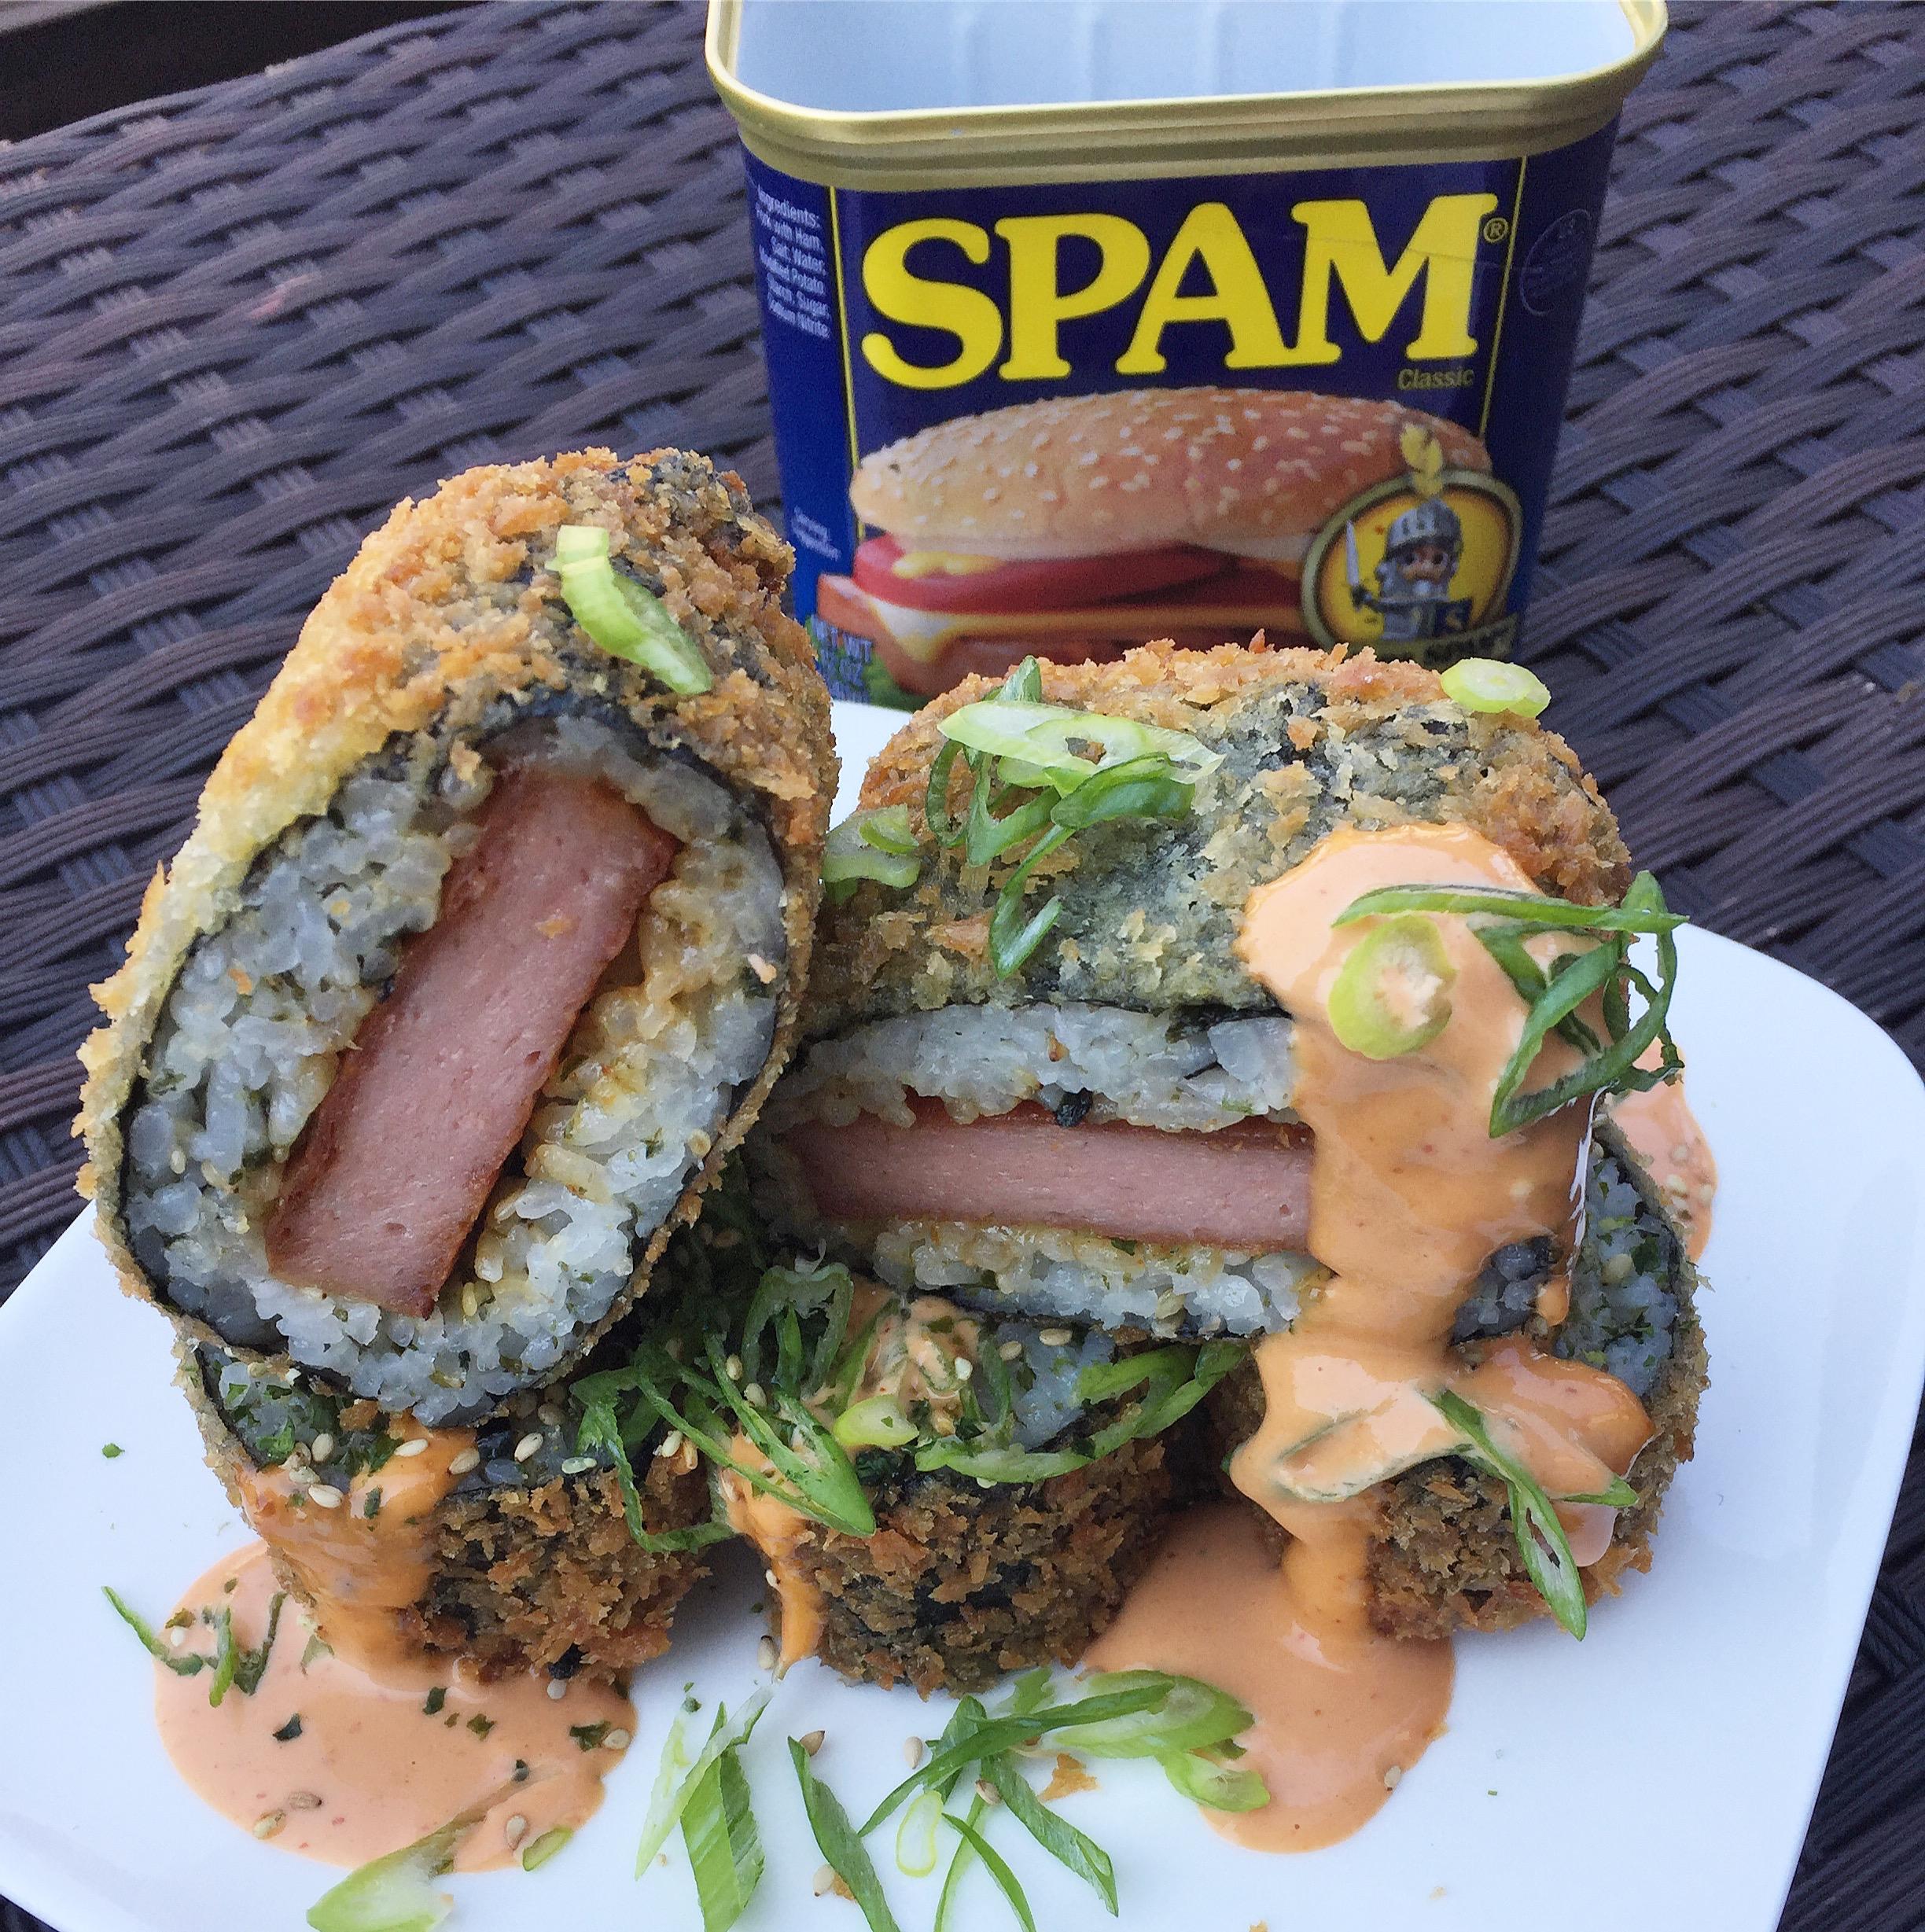 Deep-fried Spam musubi